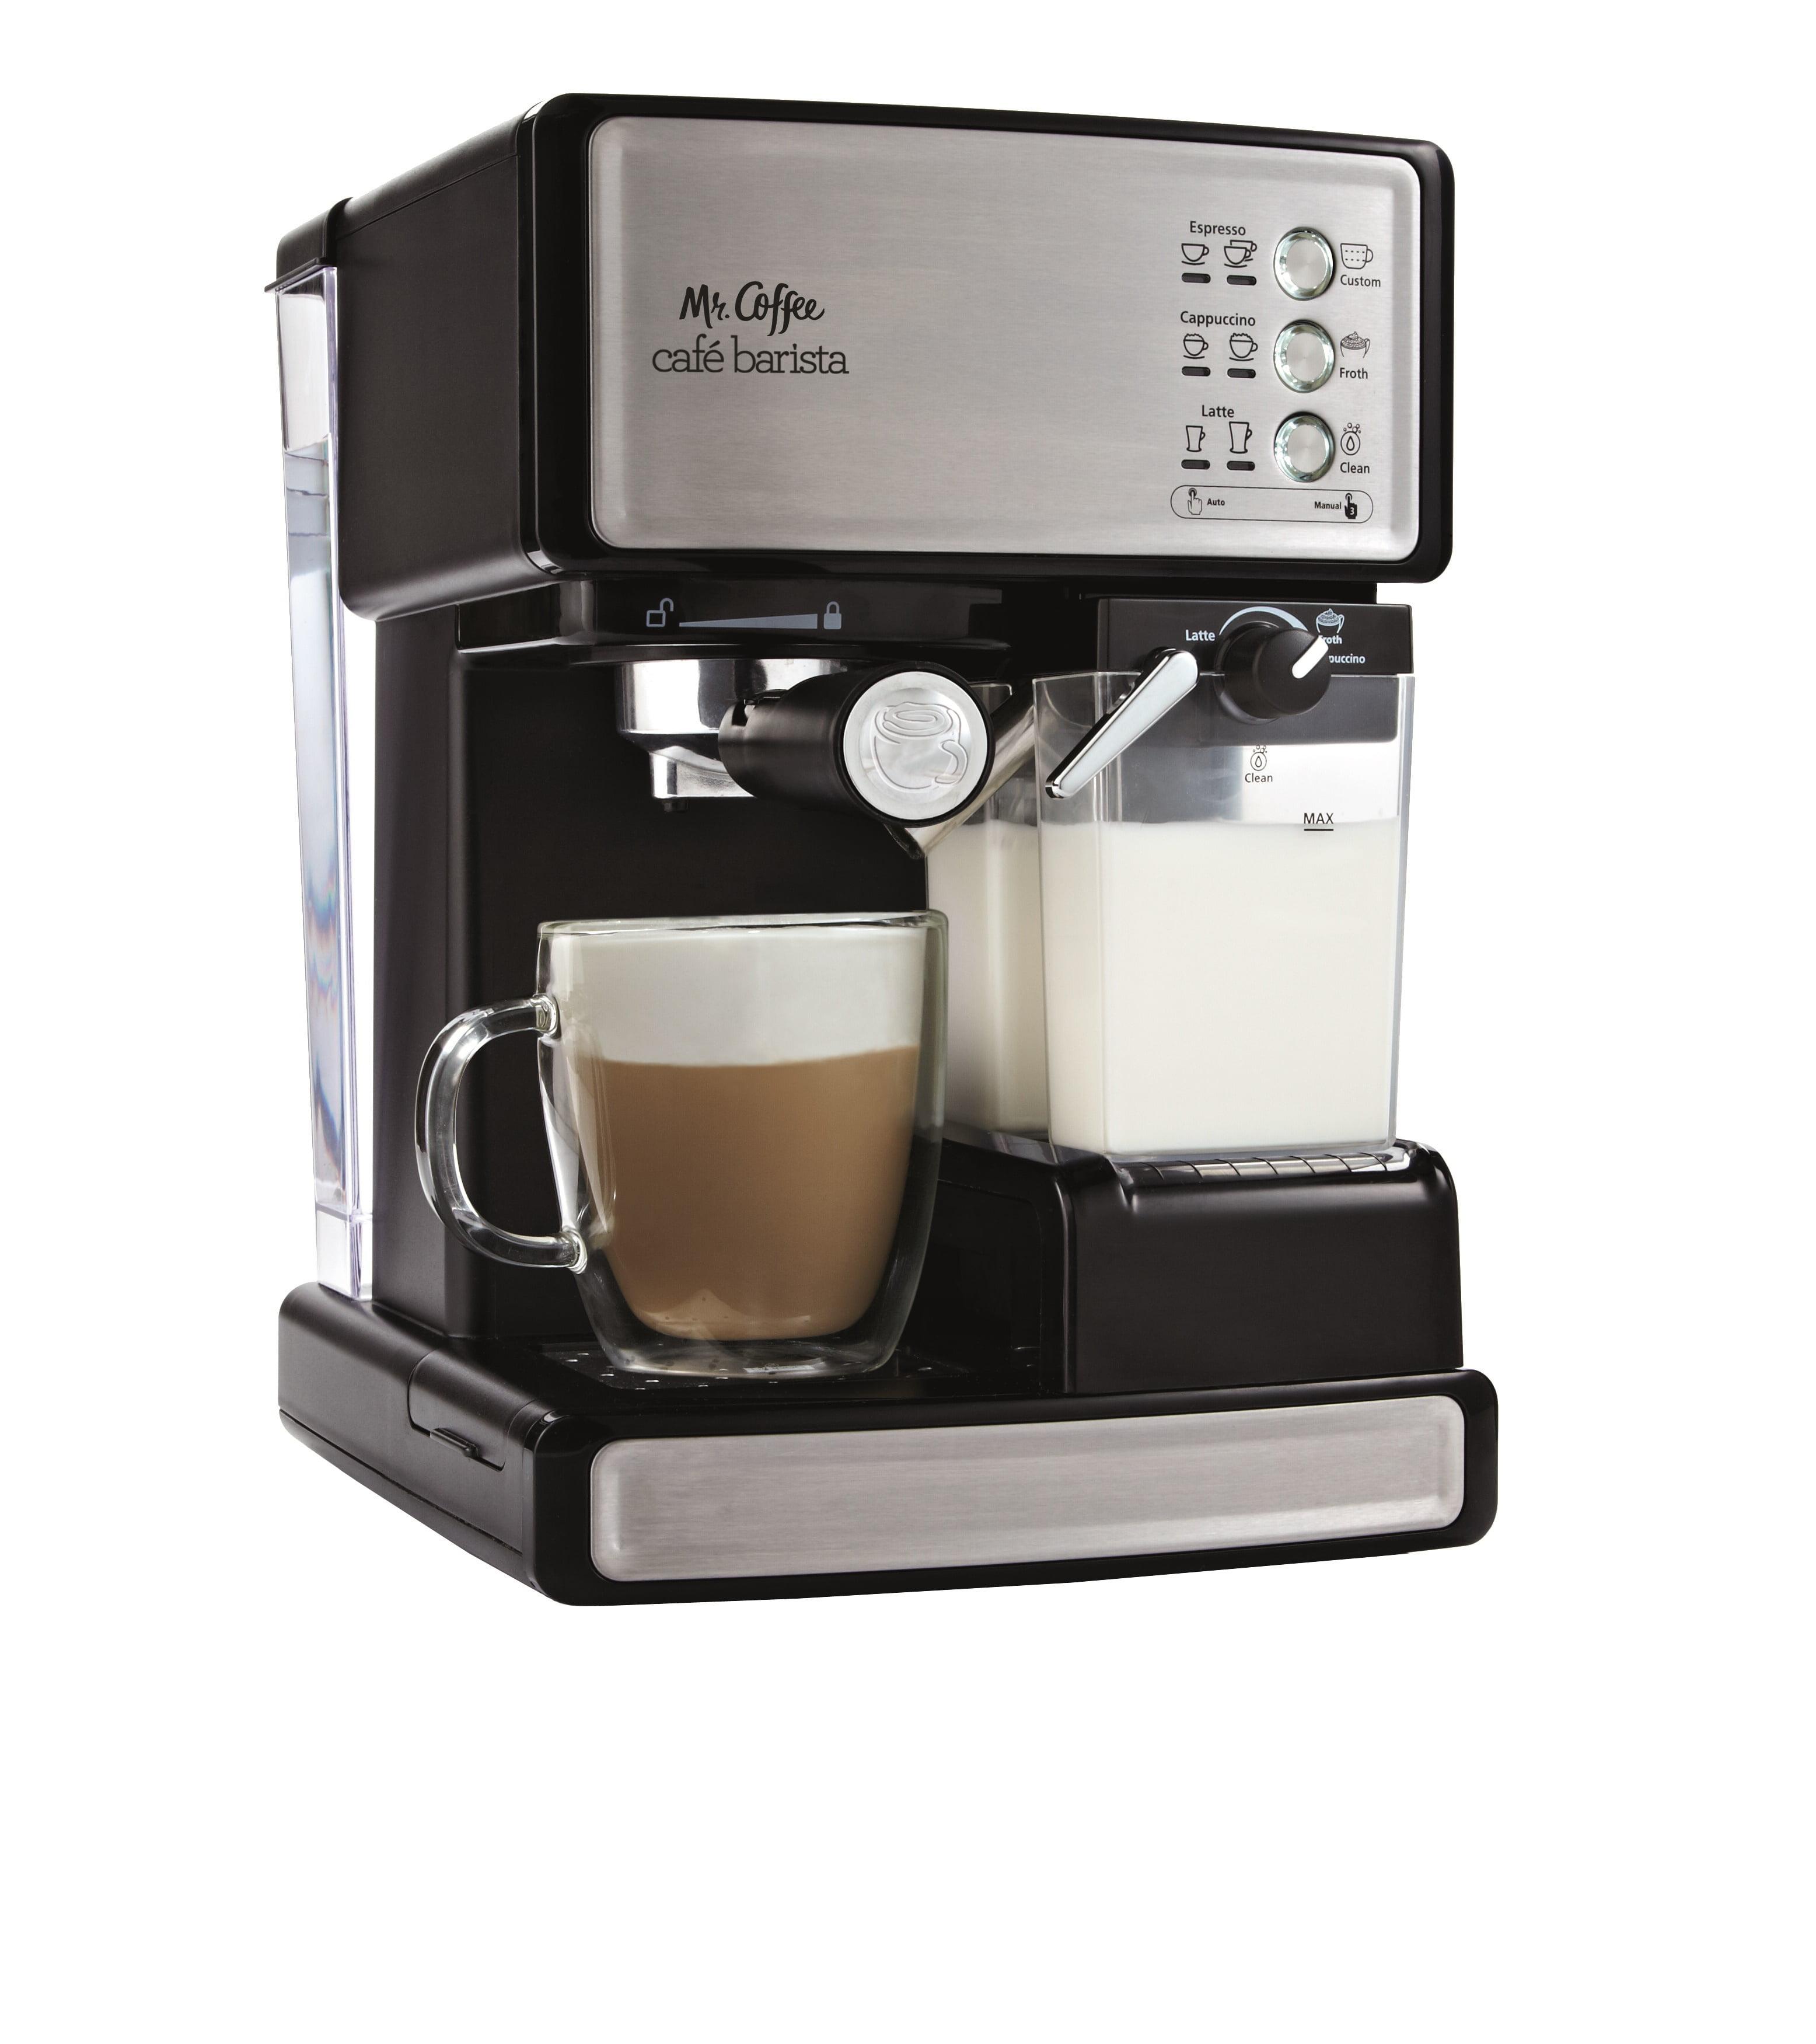 Mr Coffee Cafe Barista Espresso Maker Bvmc Ecmp1000 Black Silver